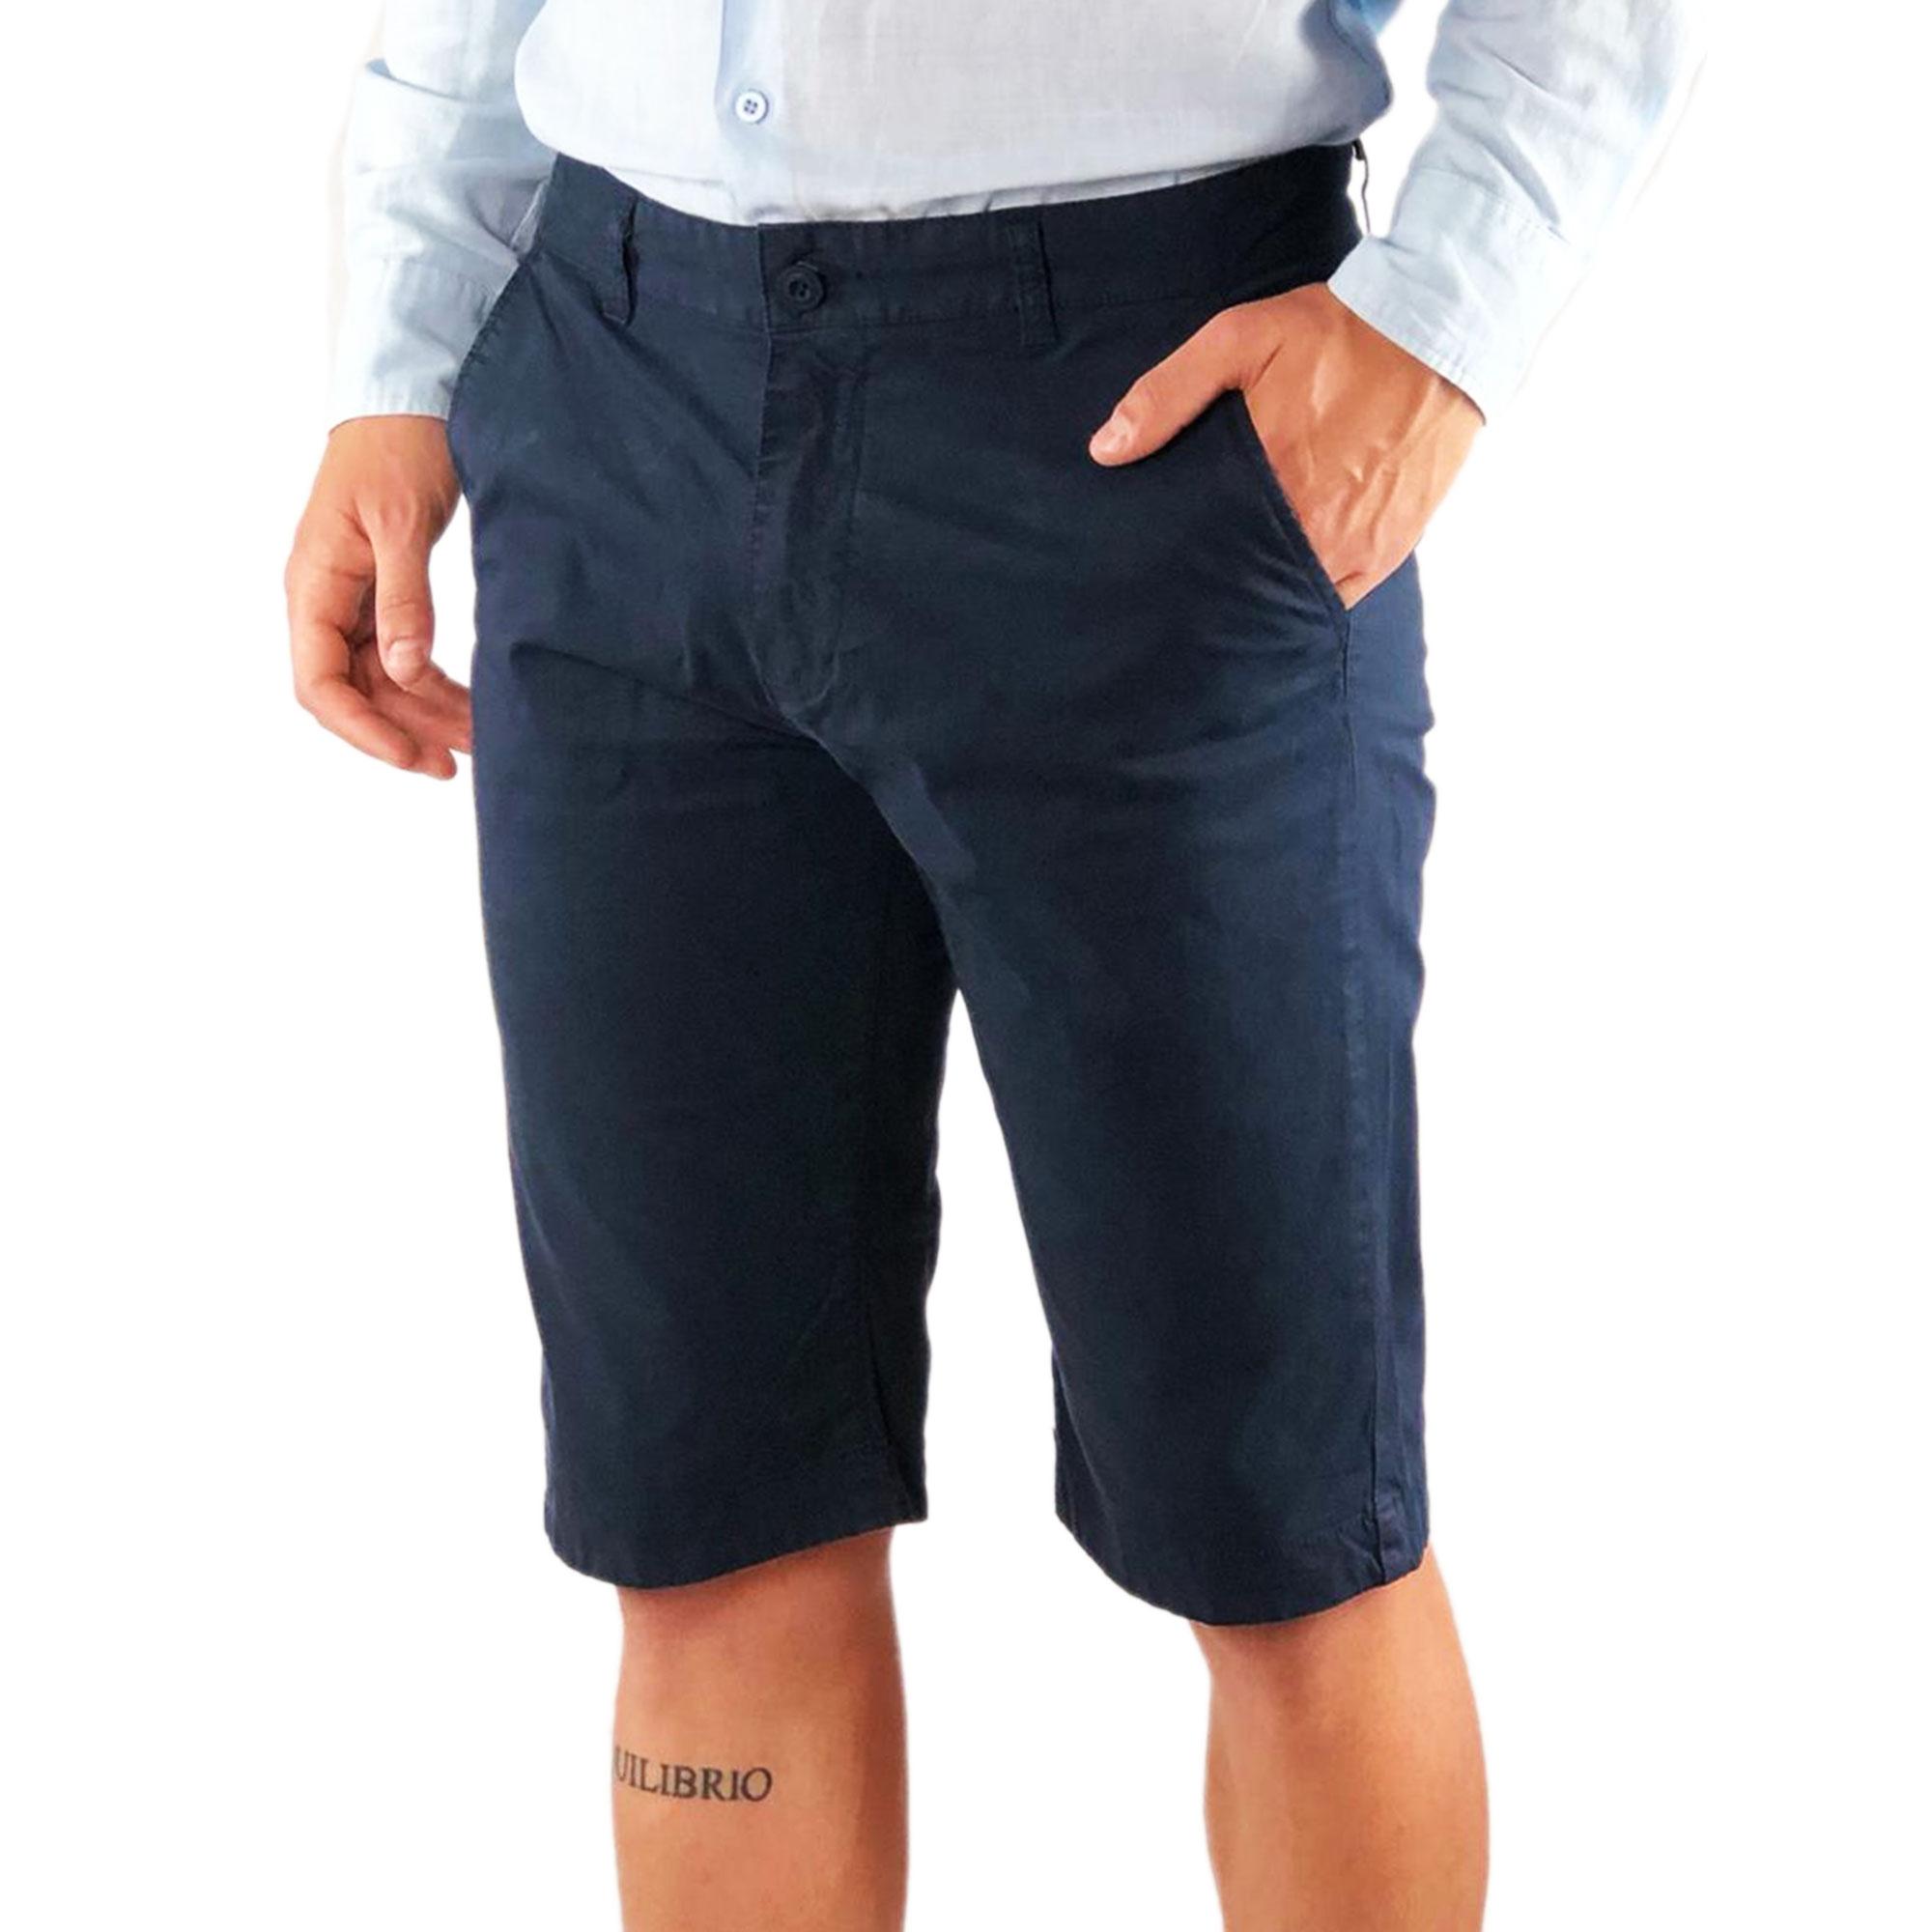 Bermuda-Uomo-Cotone-Slim-Fit-Jeans-Pantalone-Corto-Shorts-Pantaloncini-Casual miniatura 6